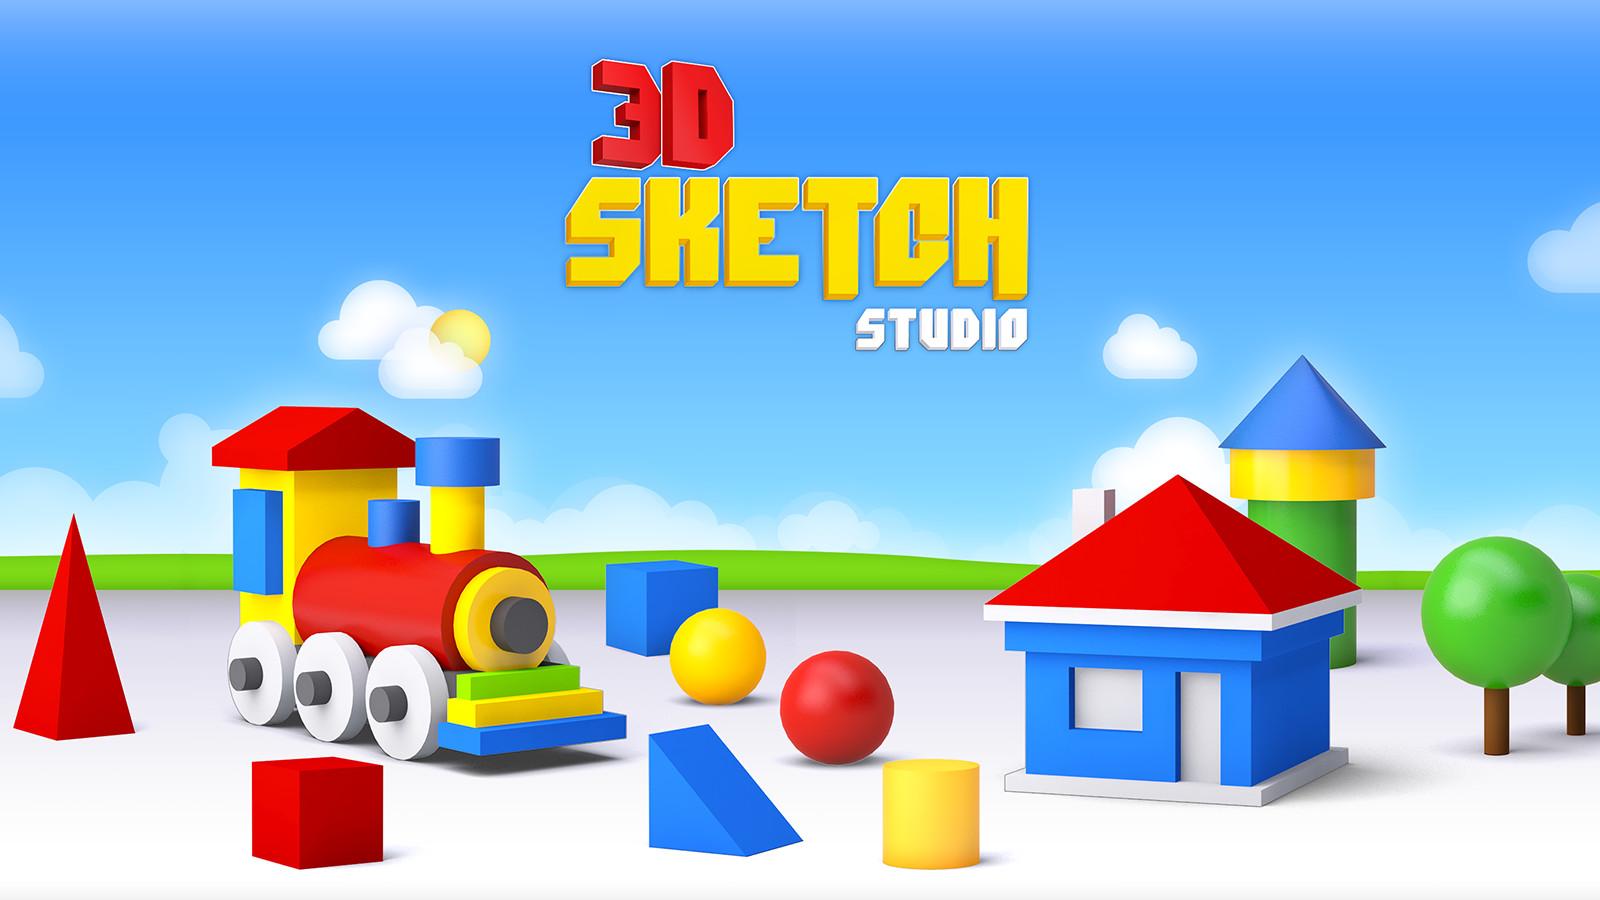 Play Video - 3D Sketch Studio